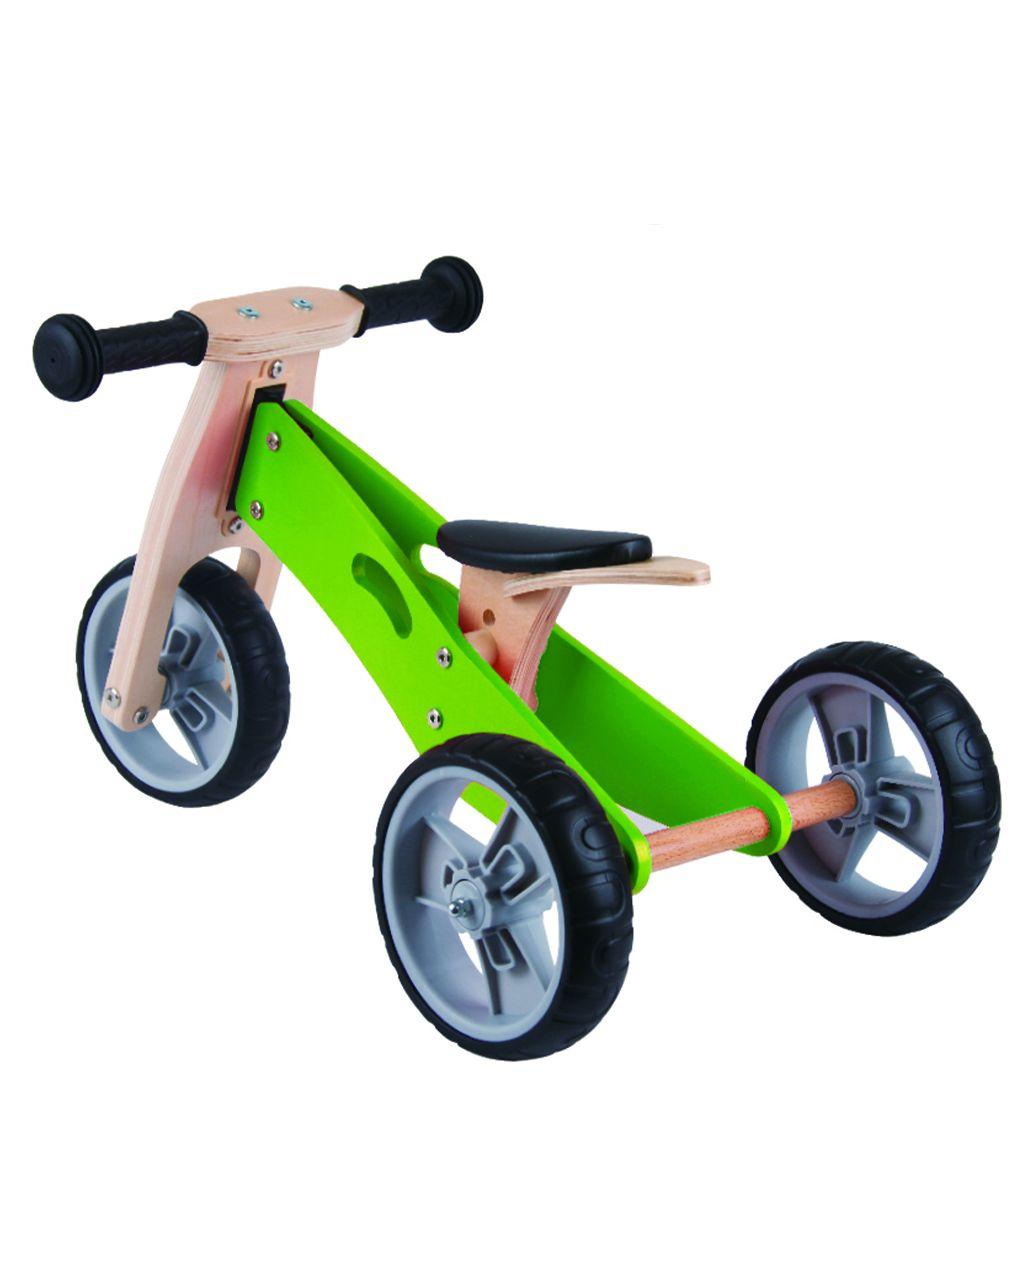 Udeas - minibike 2 in 1 - verde - Udeas